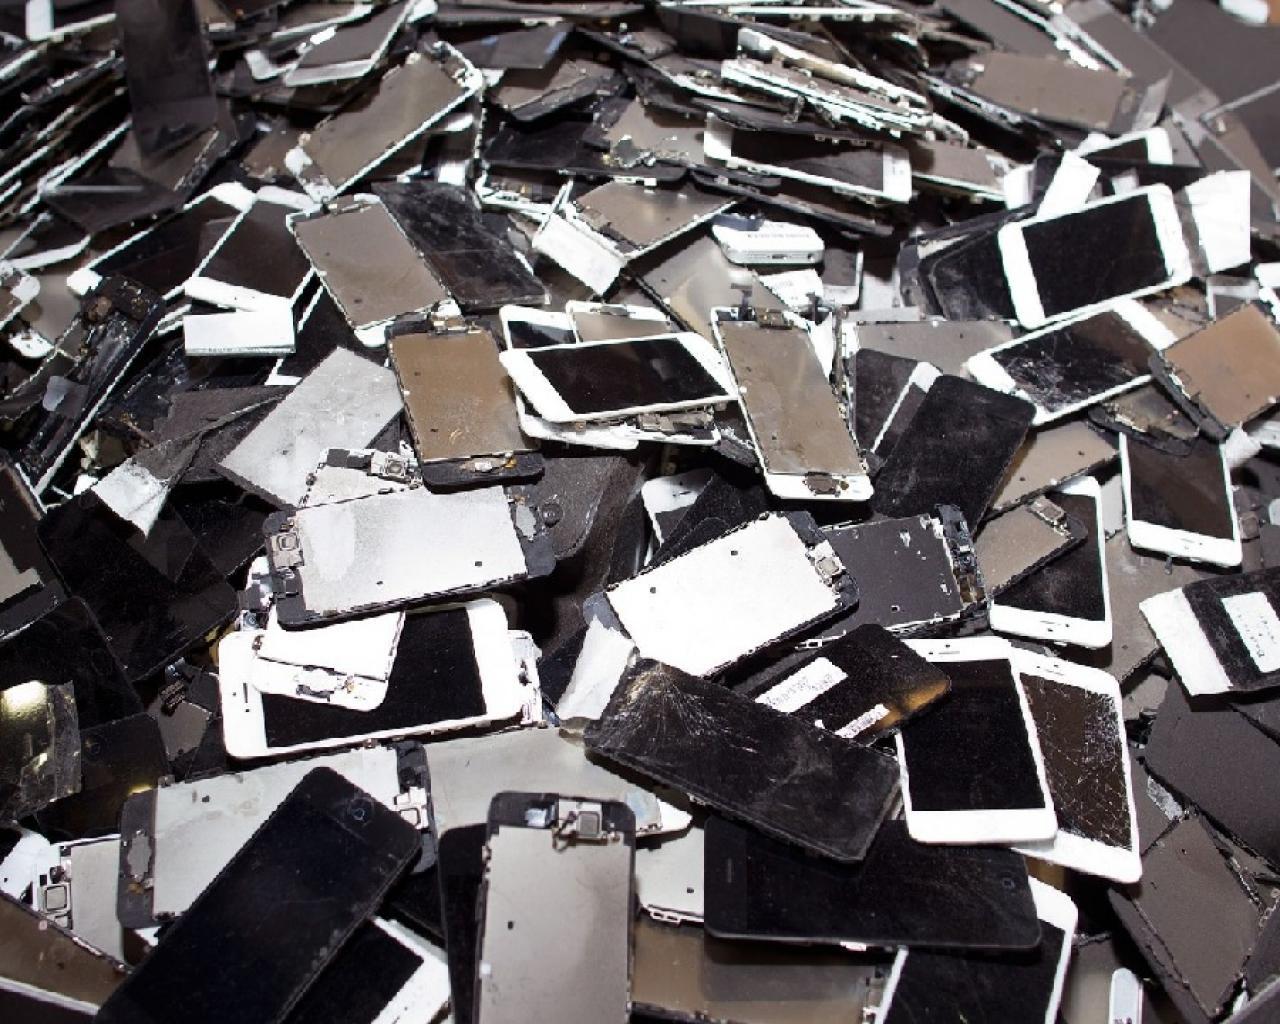 ed21d9_Smartphone- desechado-4